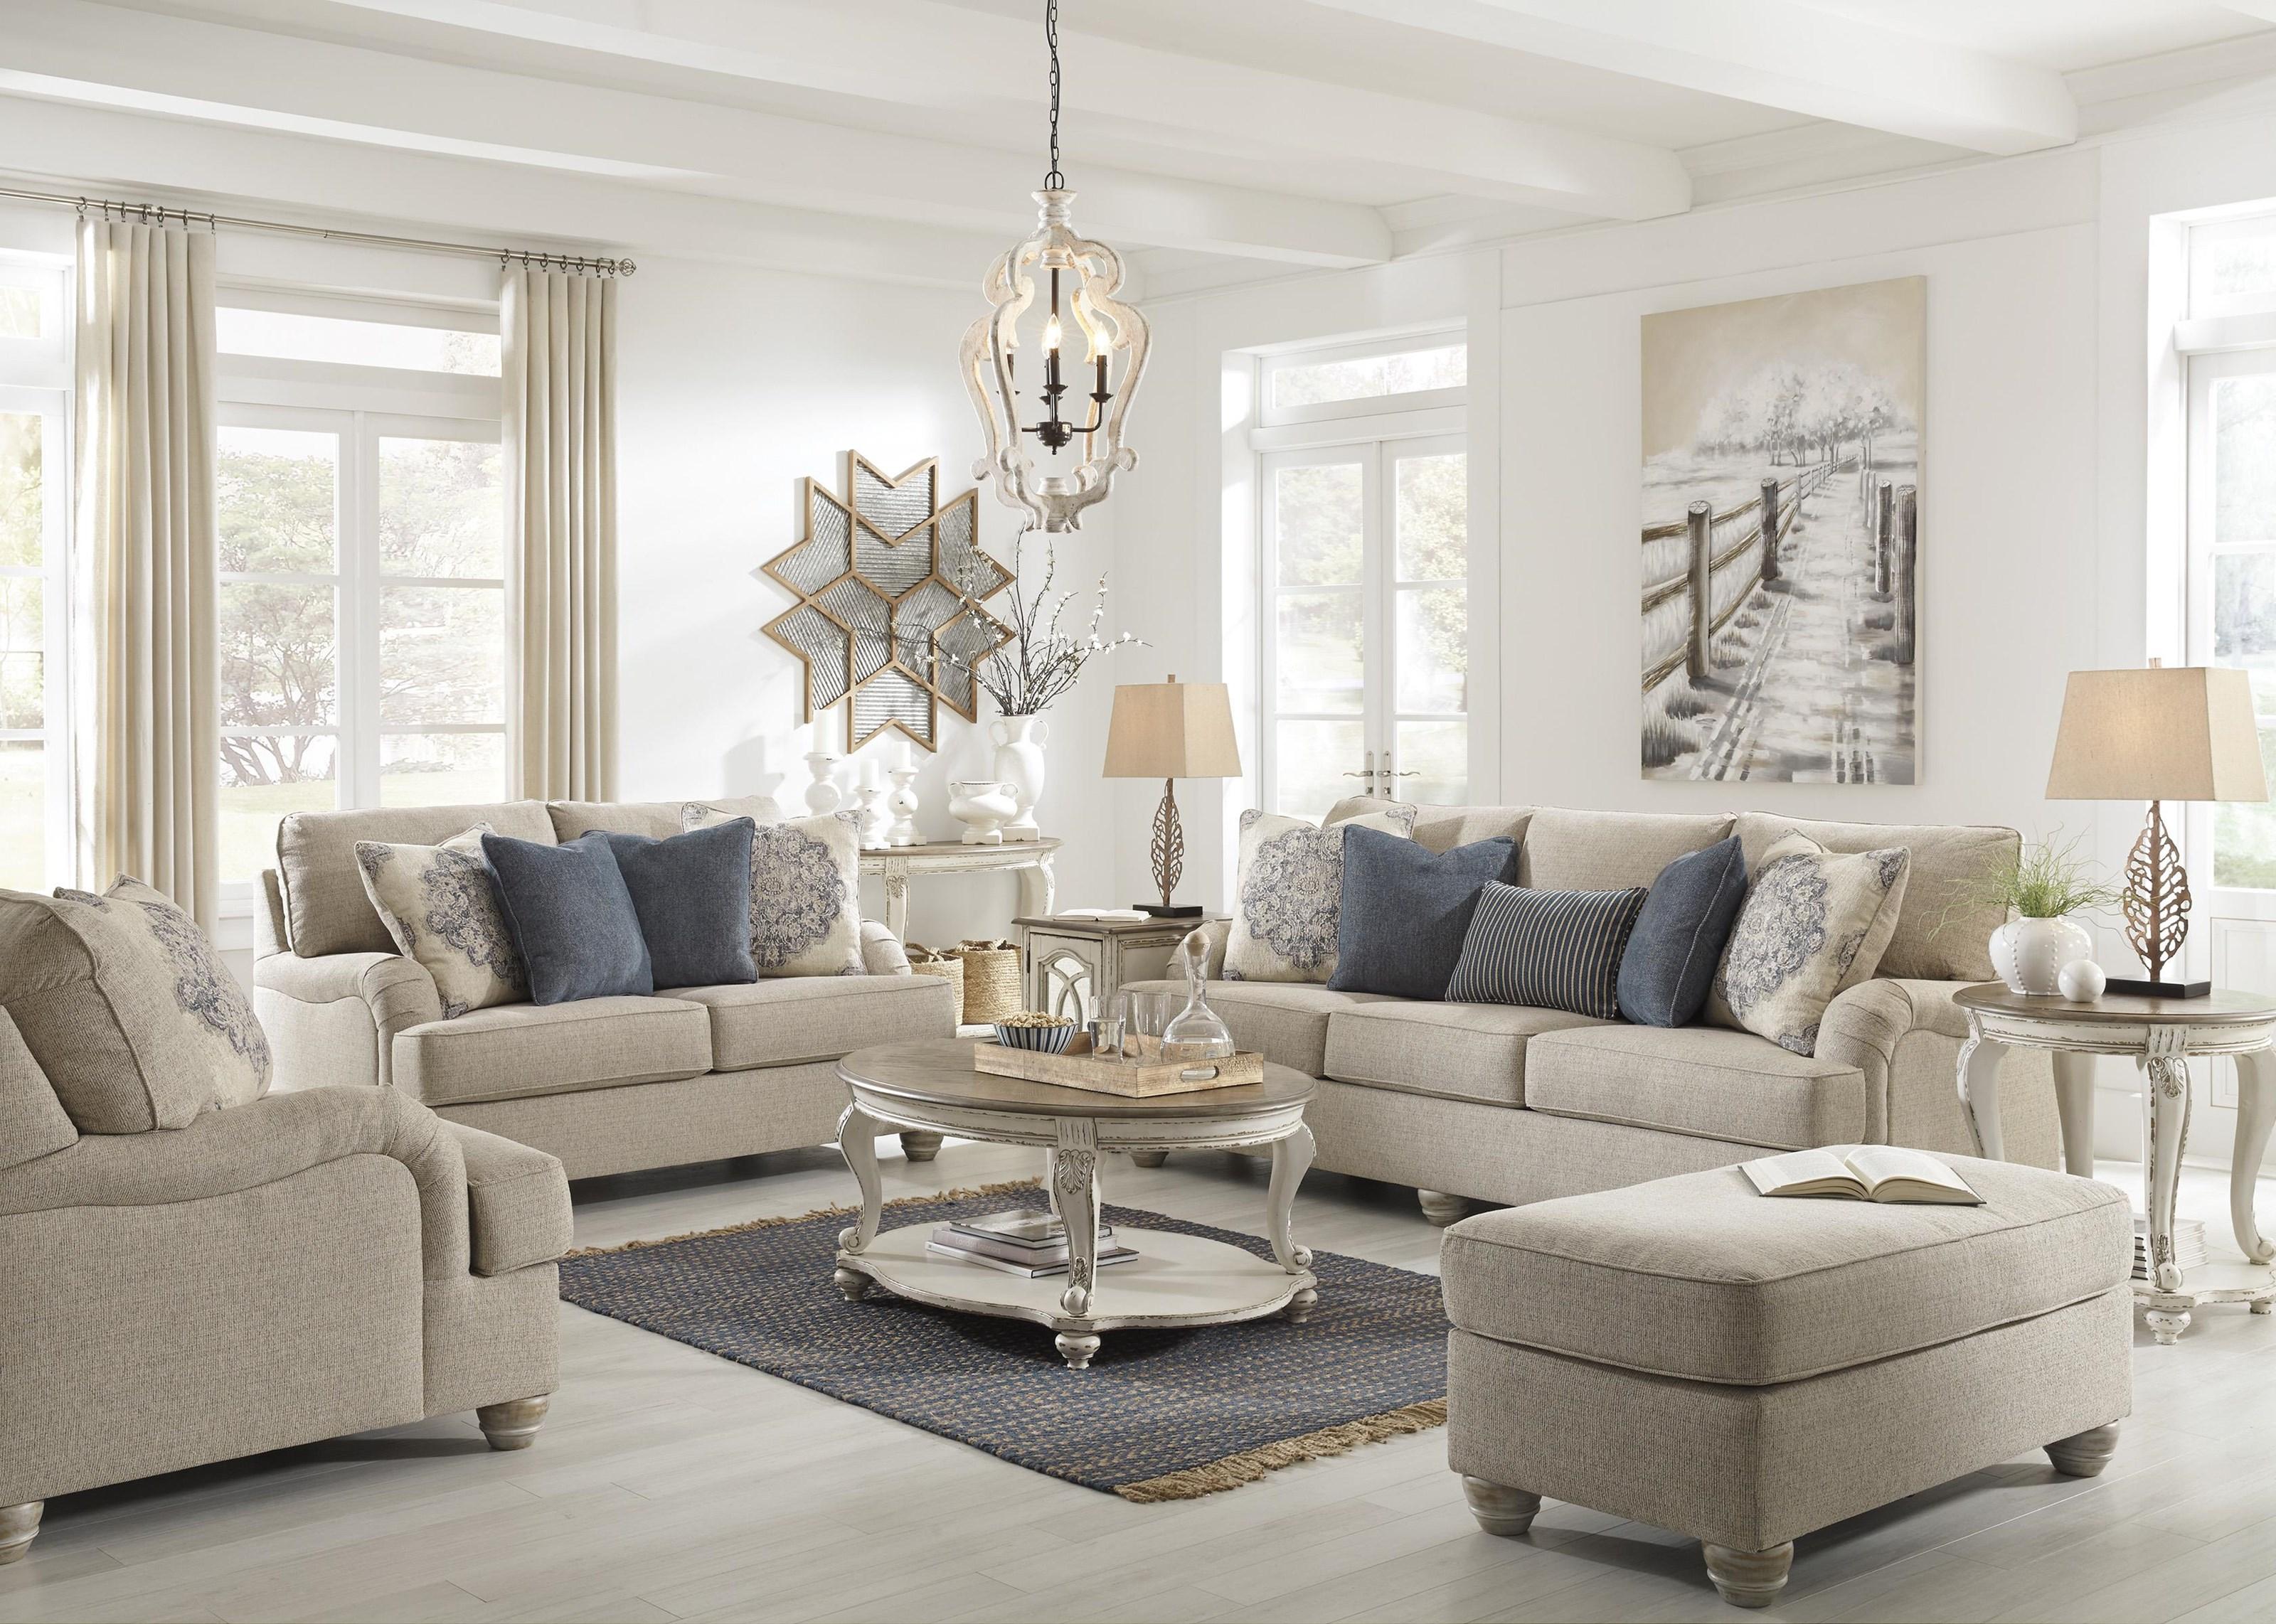 ashley furniture dandrea 9900438352314 bisque sofa